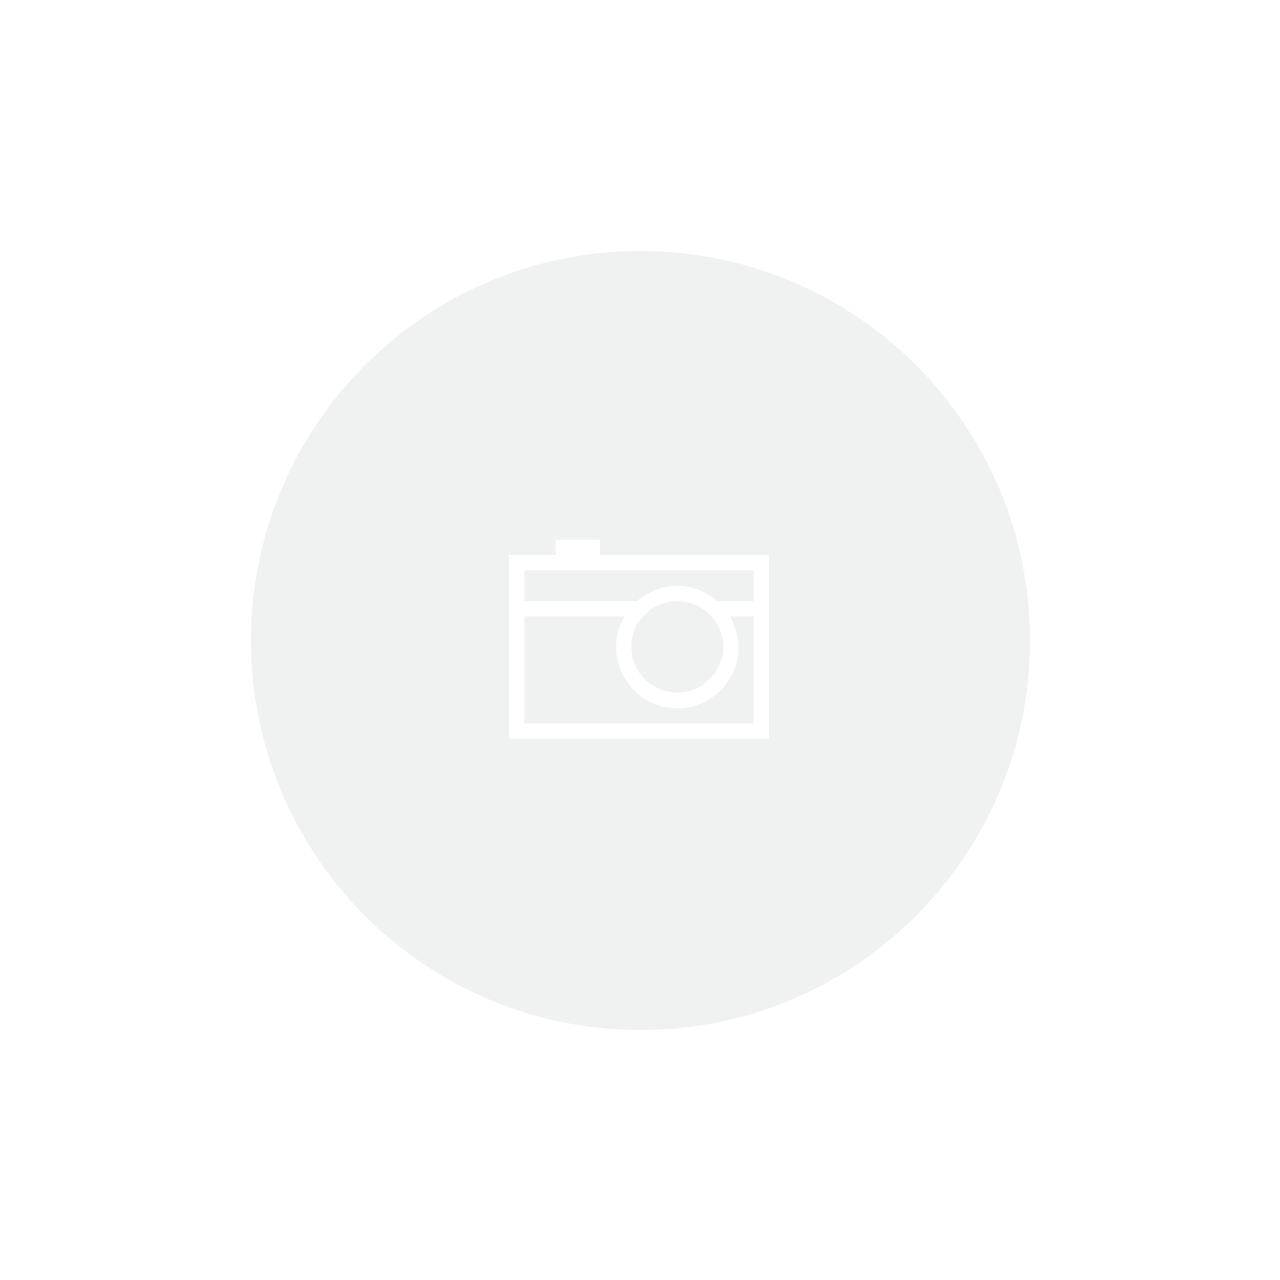 CANIVETE CRANK BROTHERS 19F C/ EXTRATOR DE CORRENTE